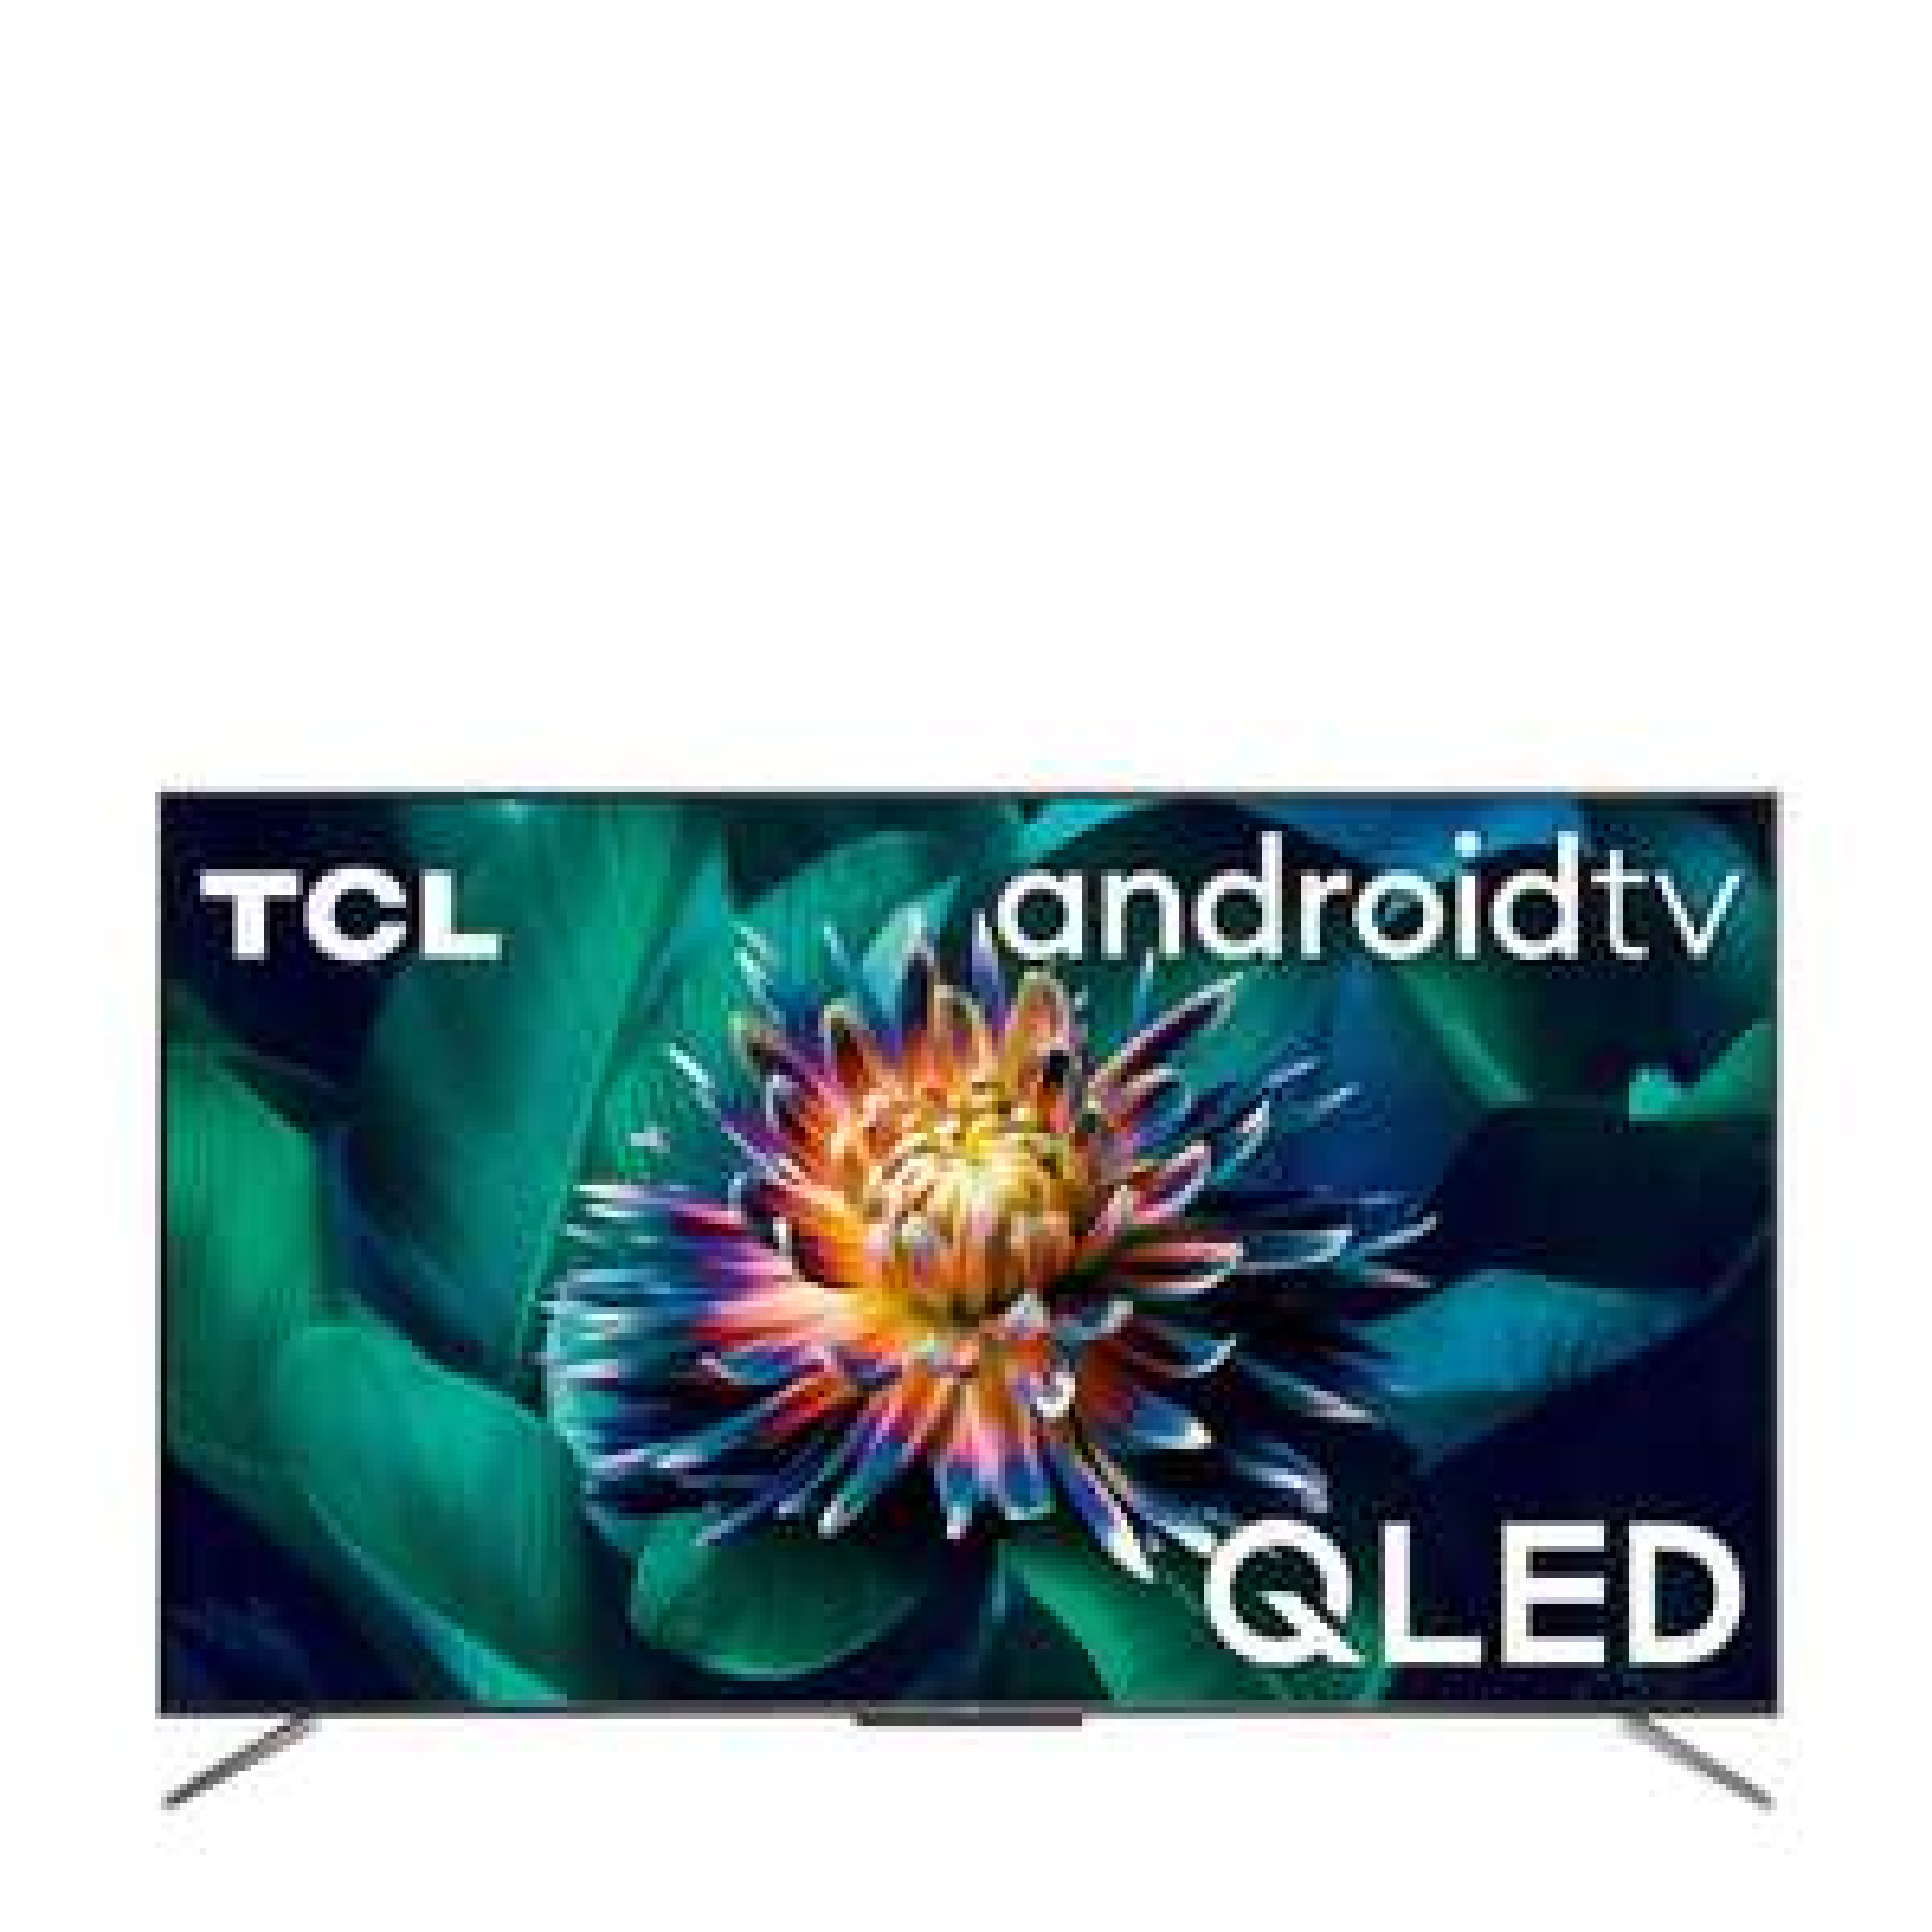 TCL 65C715 QLED 65 inch TV